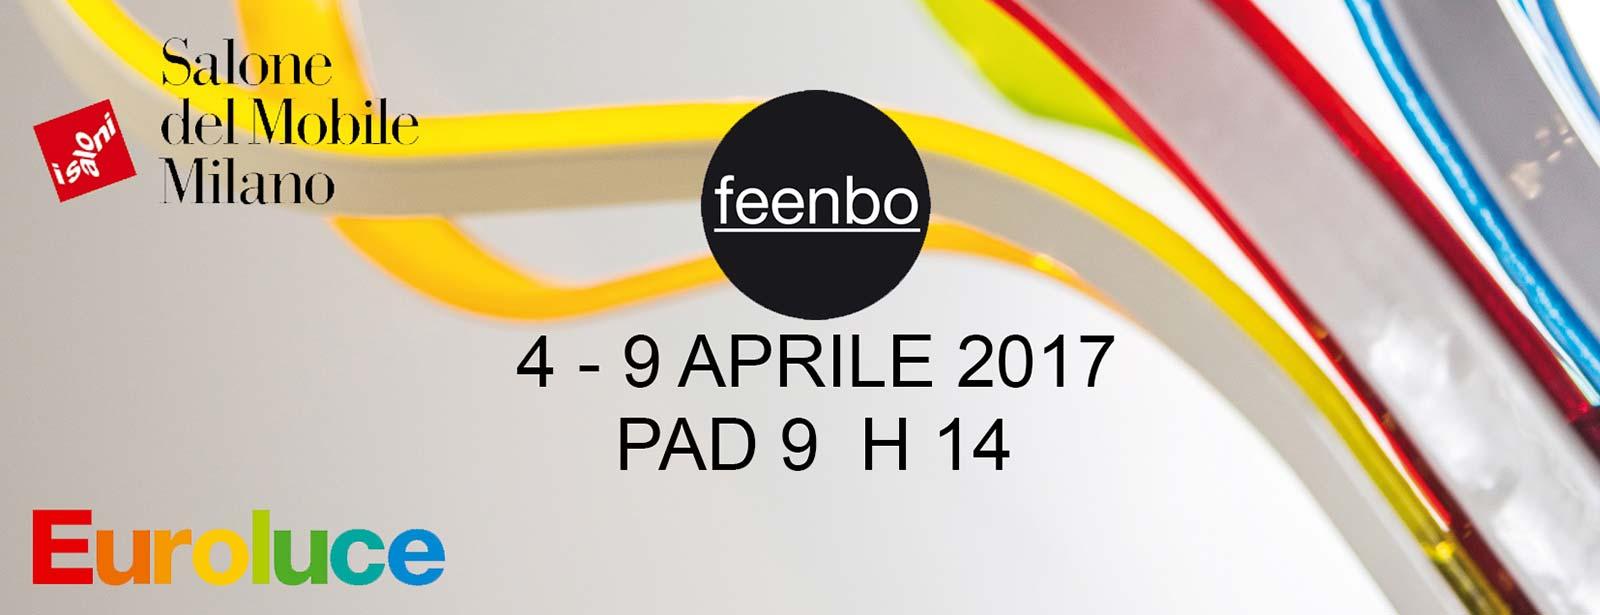 euroluce-feenbo-2017